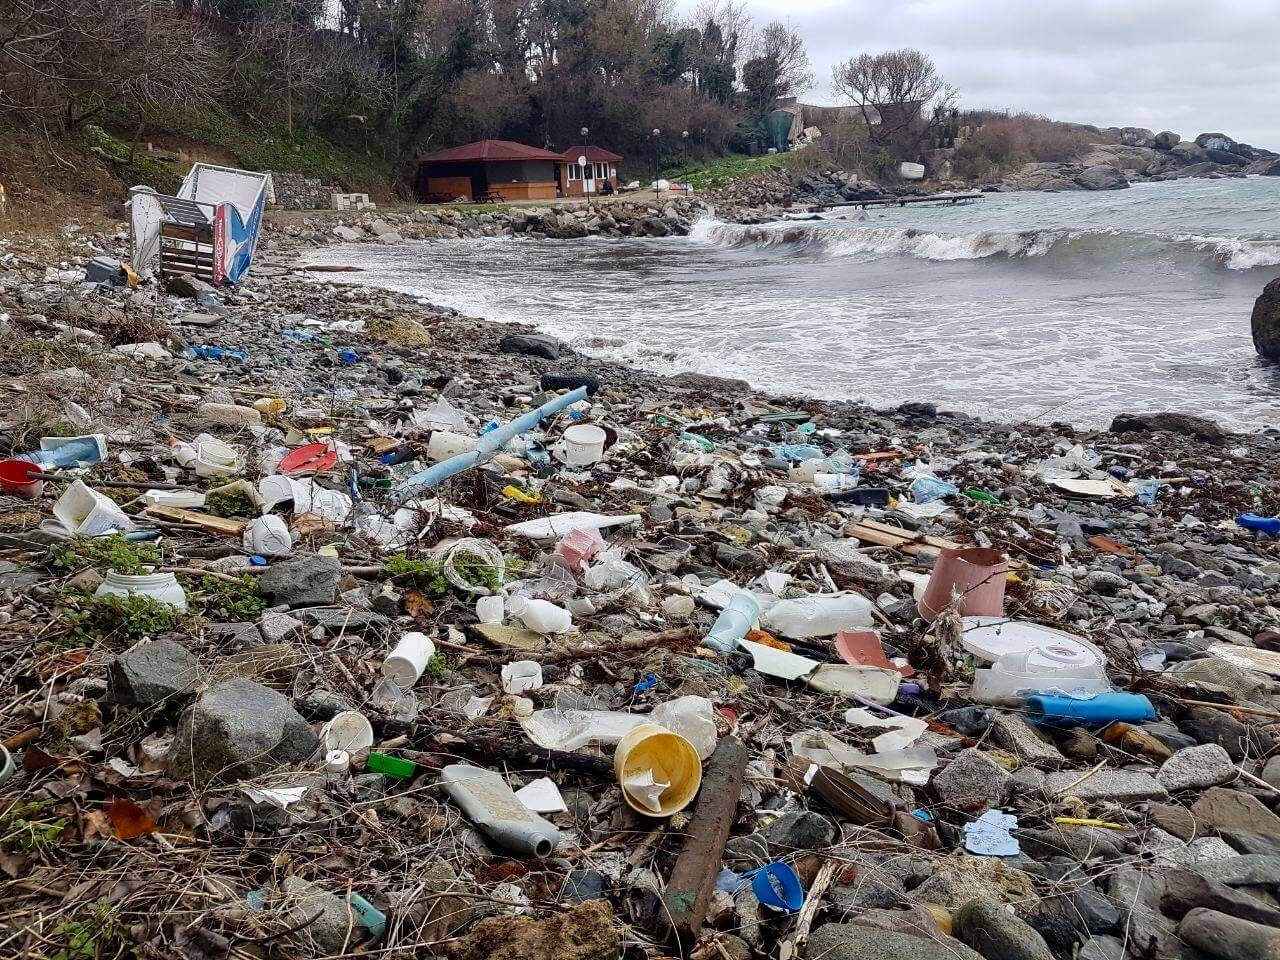 фото: Никола Бобчев/ Less Plastic Bulgaria